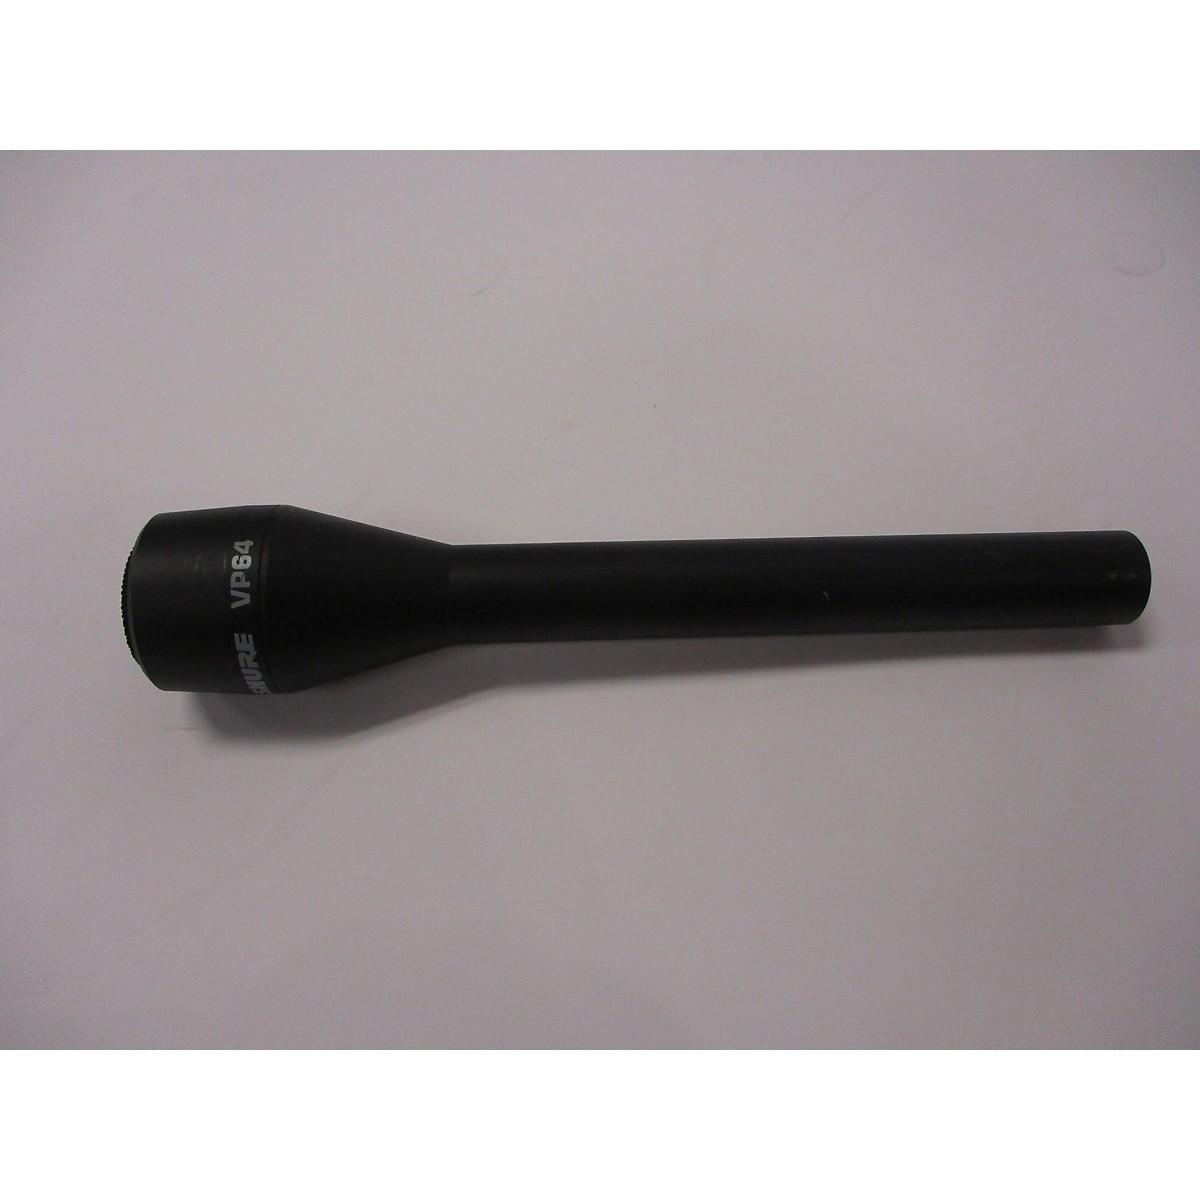 Shure VP64 Dynamic Microphone